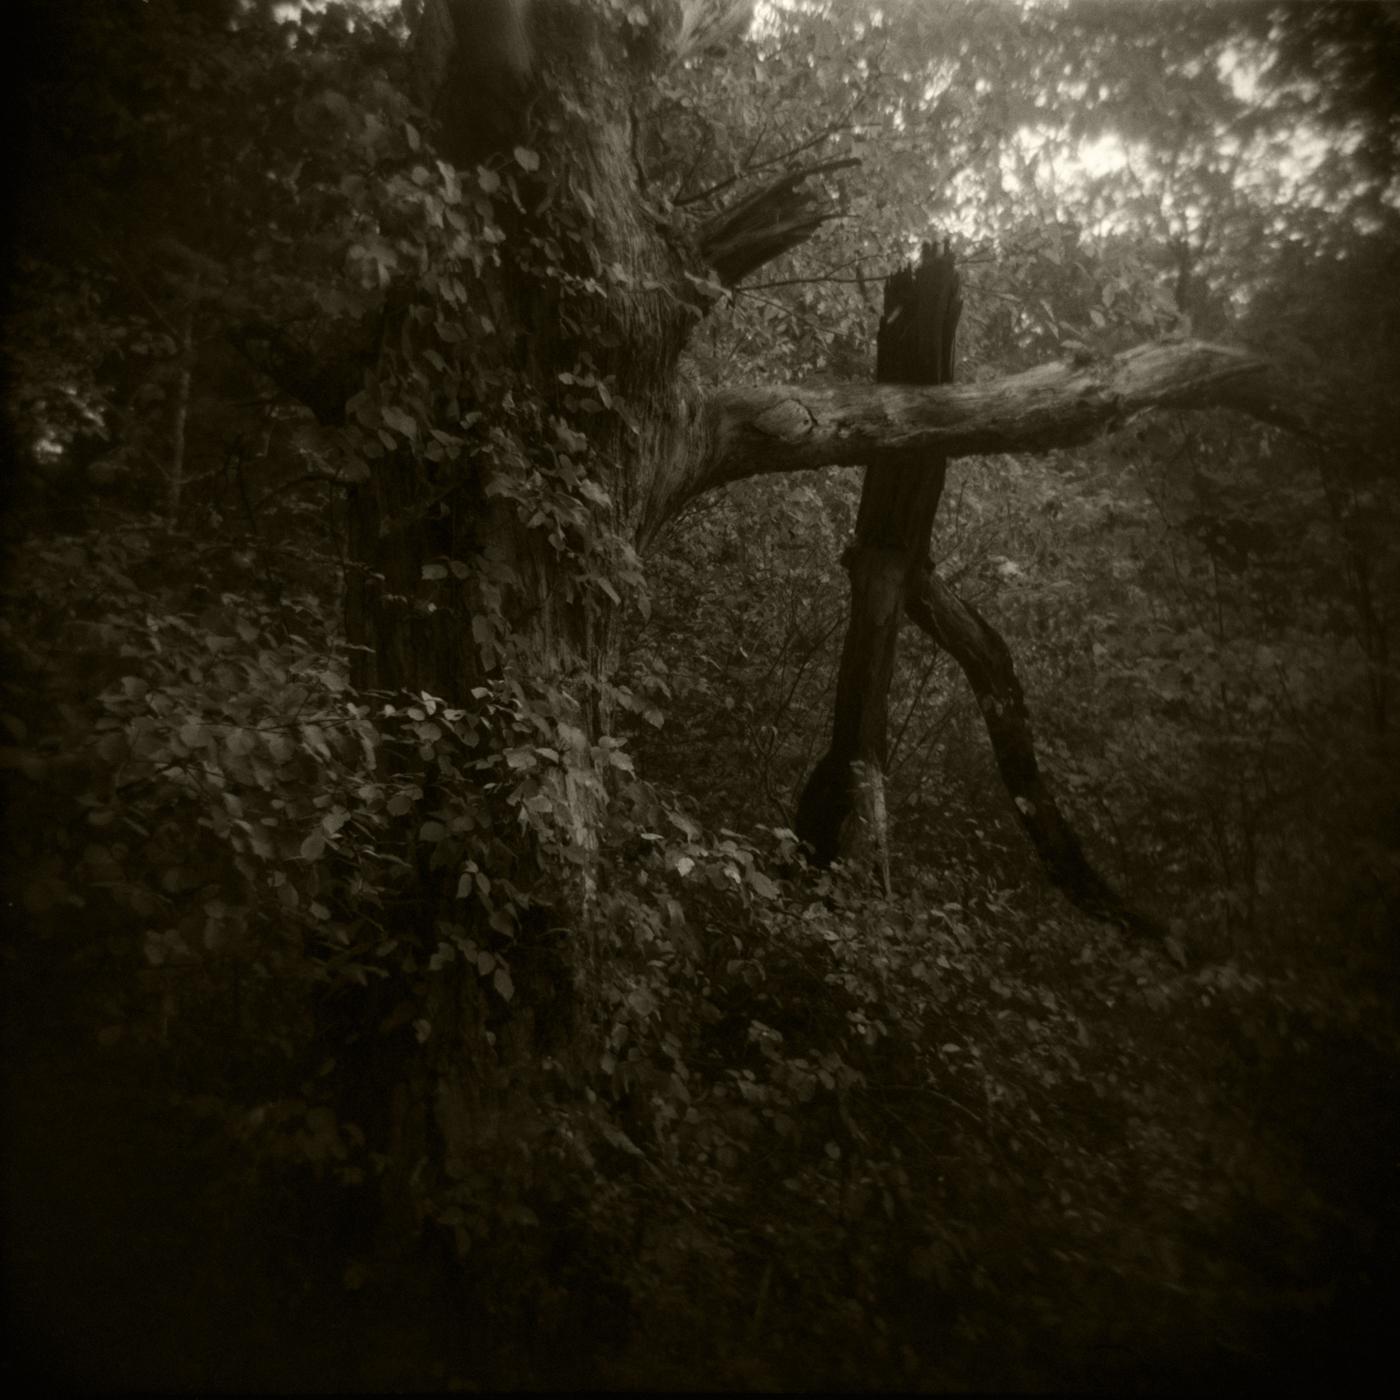 Trees 1, Medfield, MA